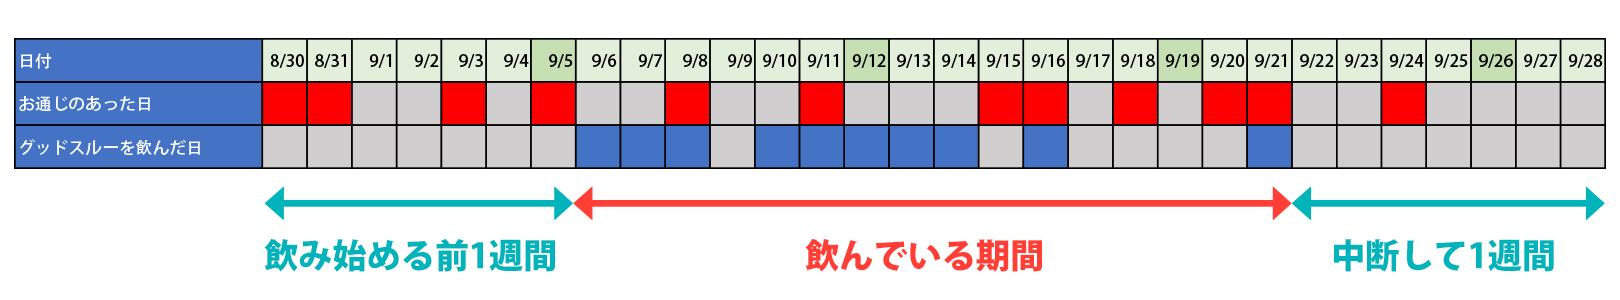 ikkagetsu-record